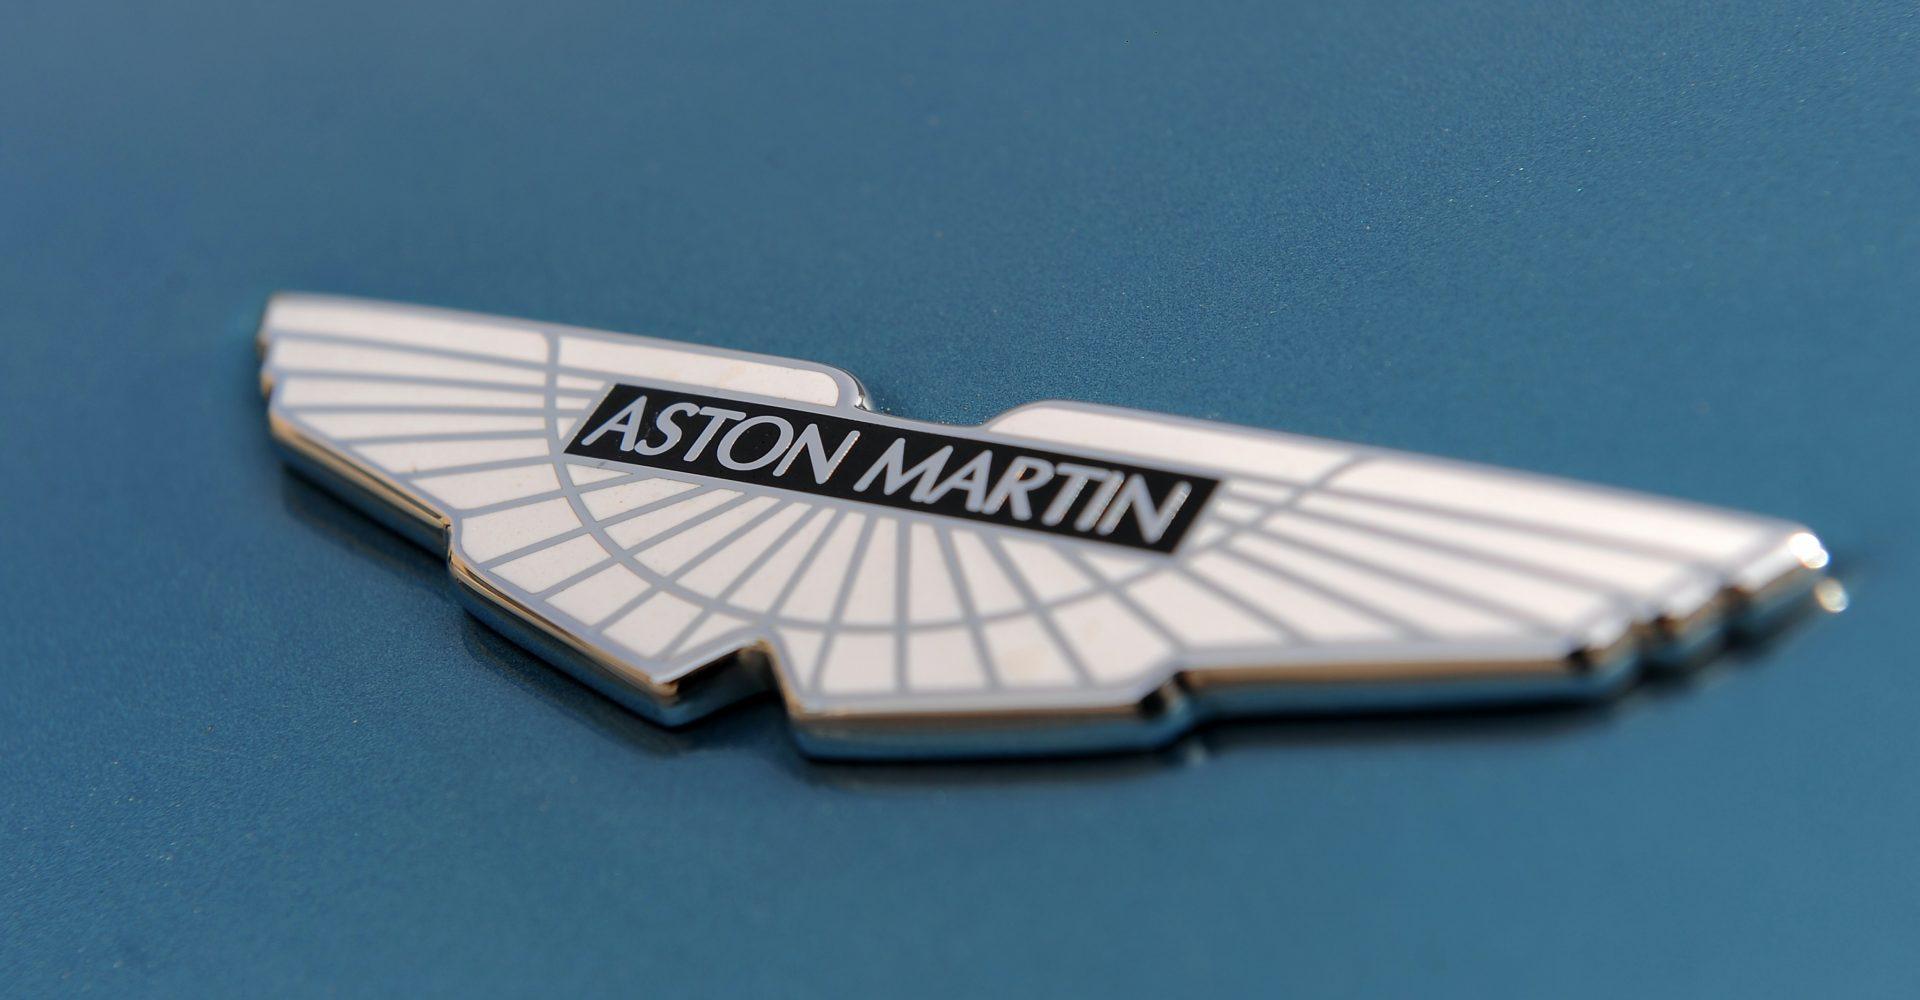 Sales halve at Aston Martin as pandemic closes dealerships